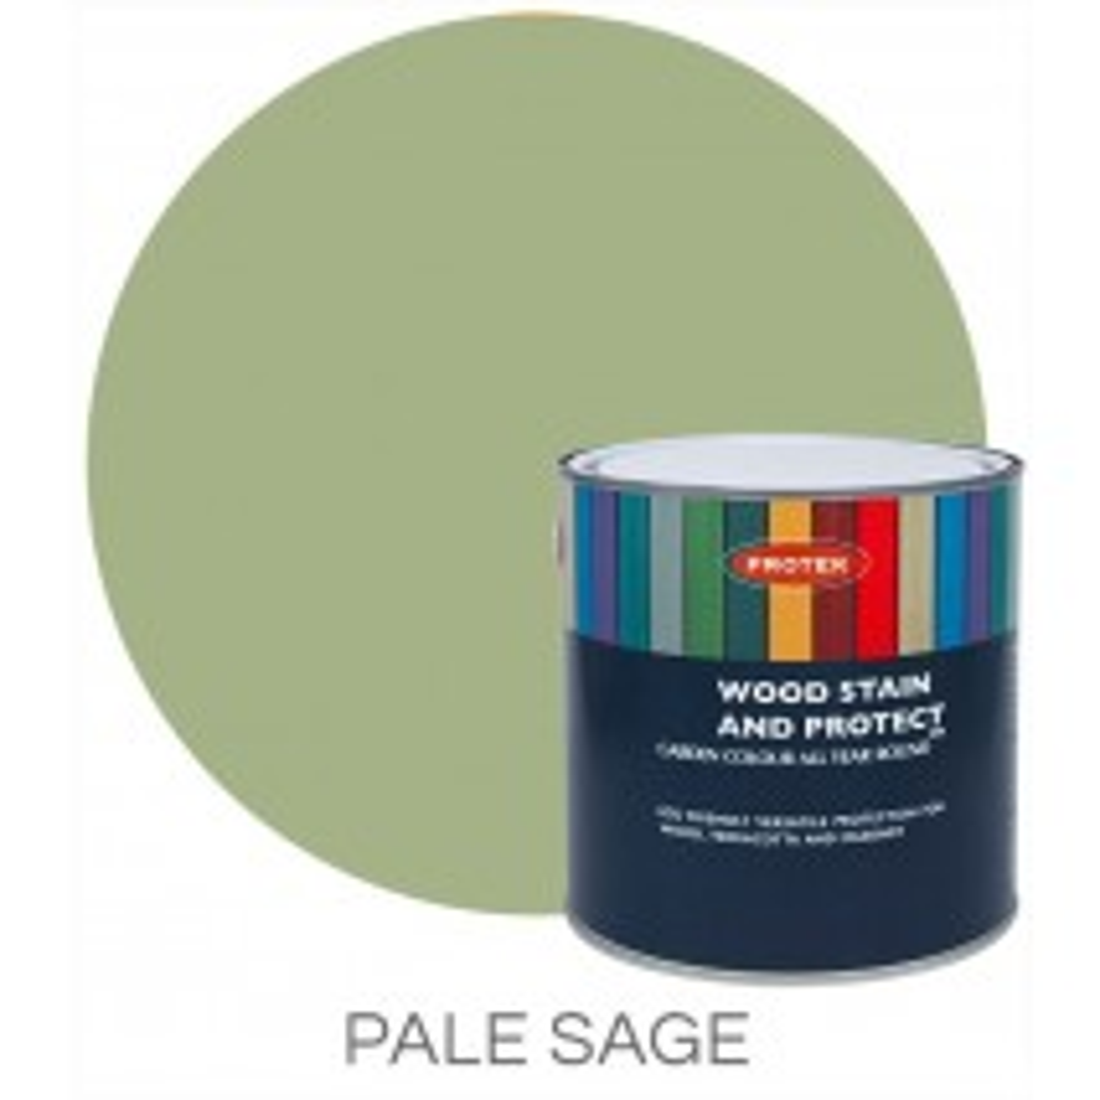 Protek Wood Stain & Protector - Pale Sage (1 litre)